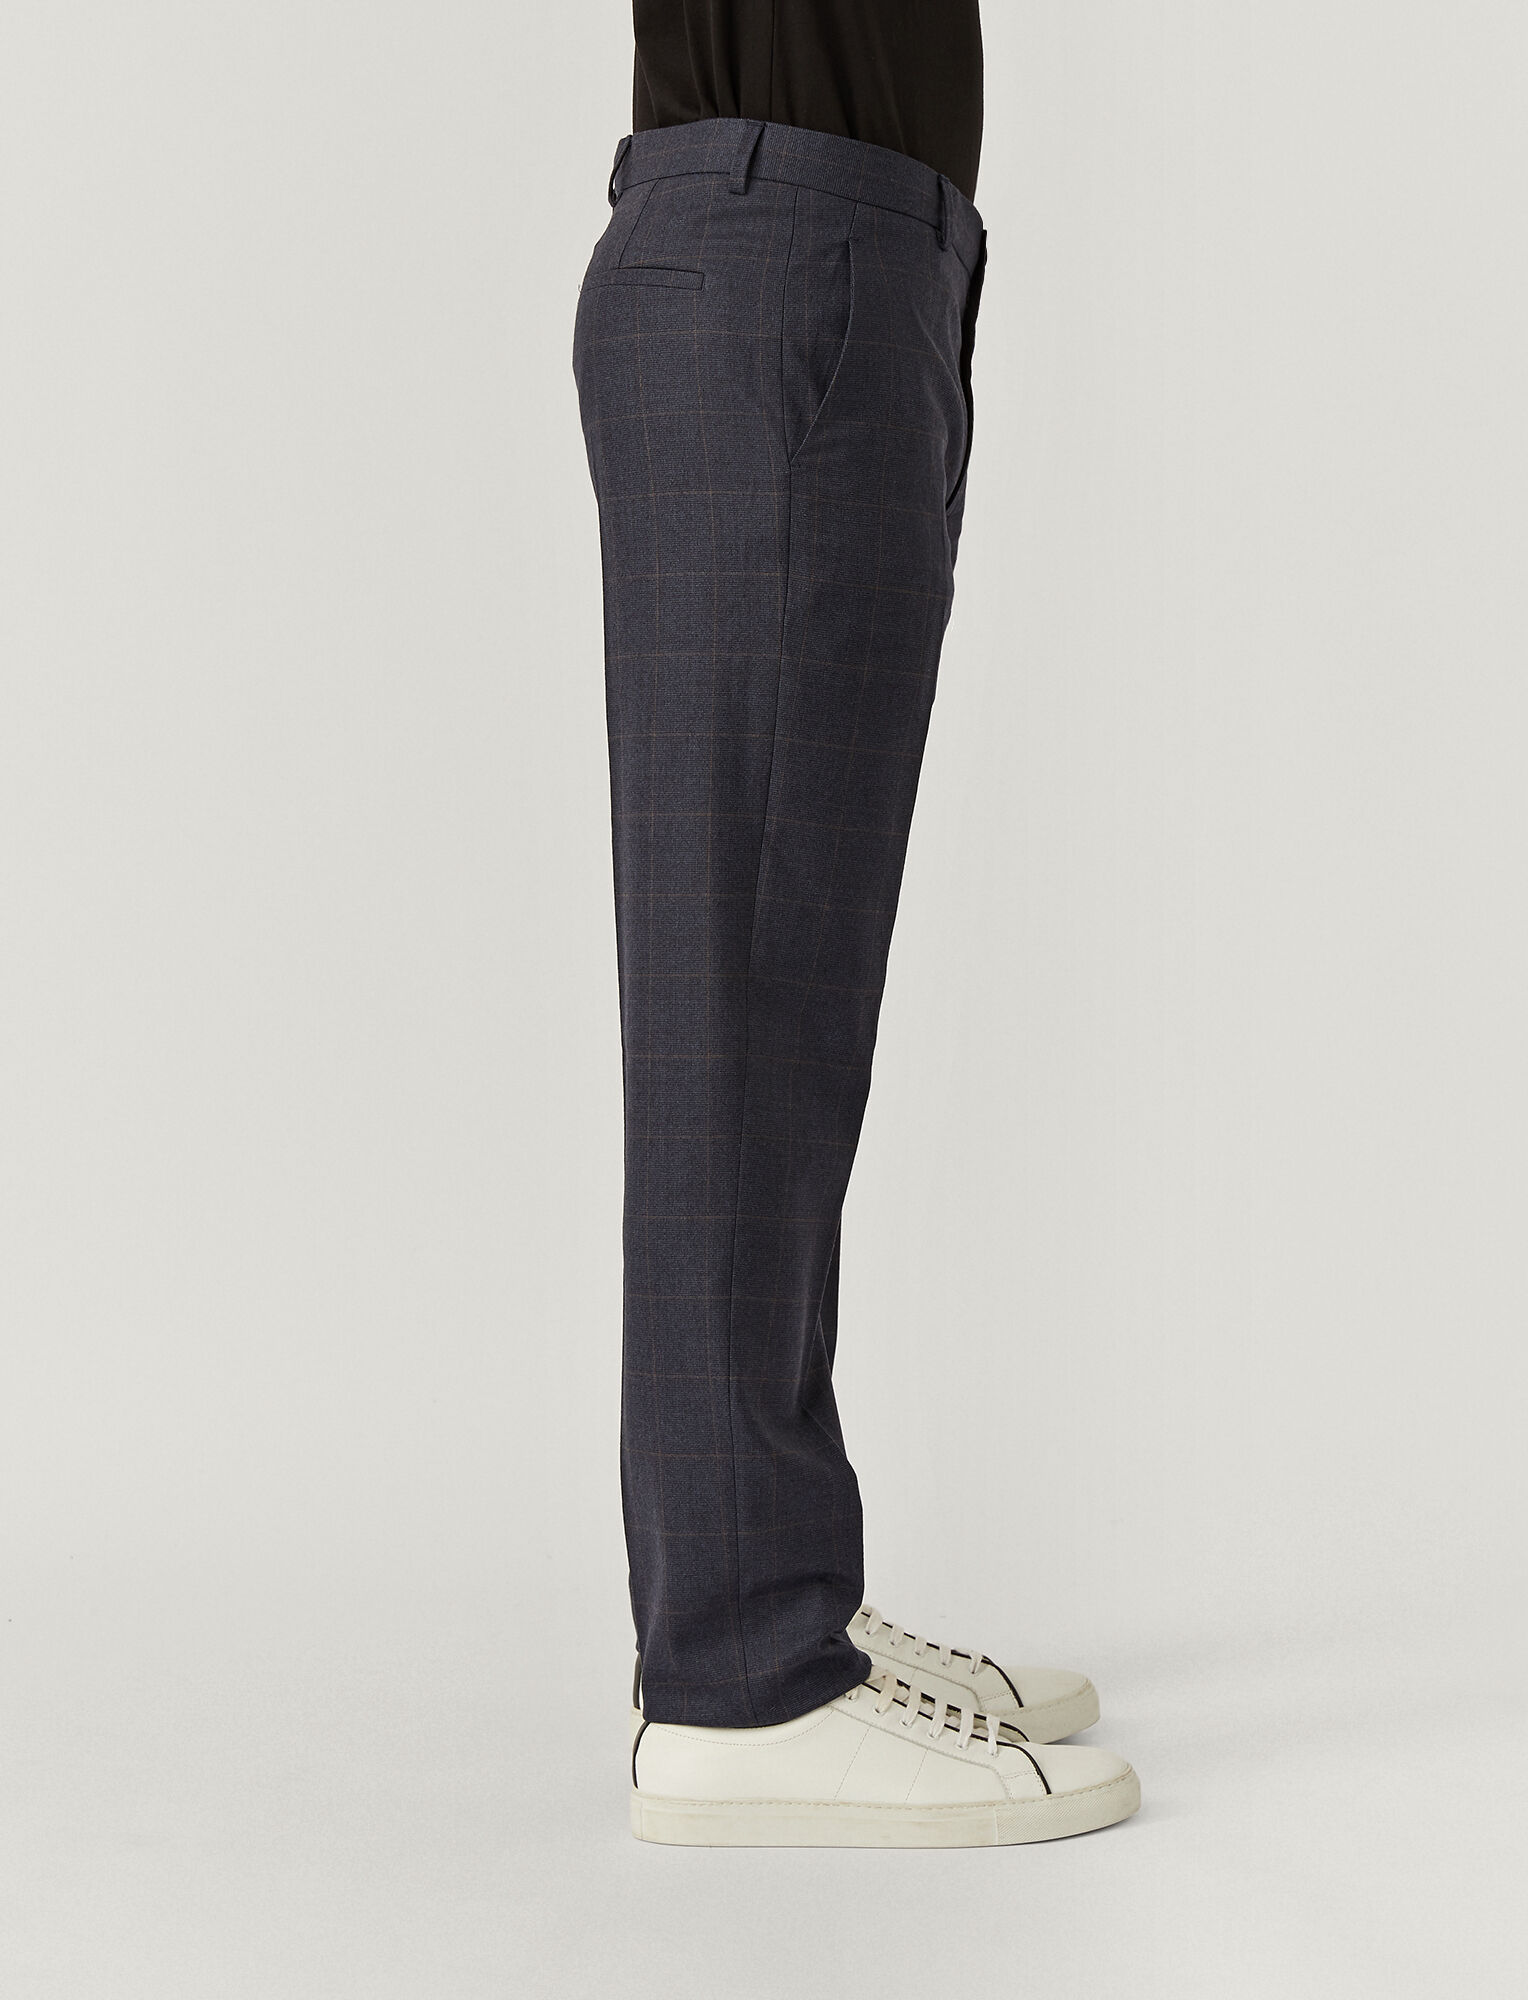 Joseph, Pantalon Jack en flanelle stretch, in NAVY